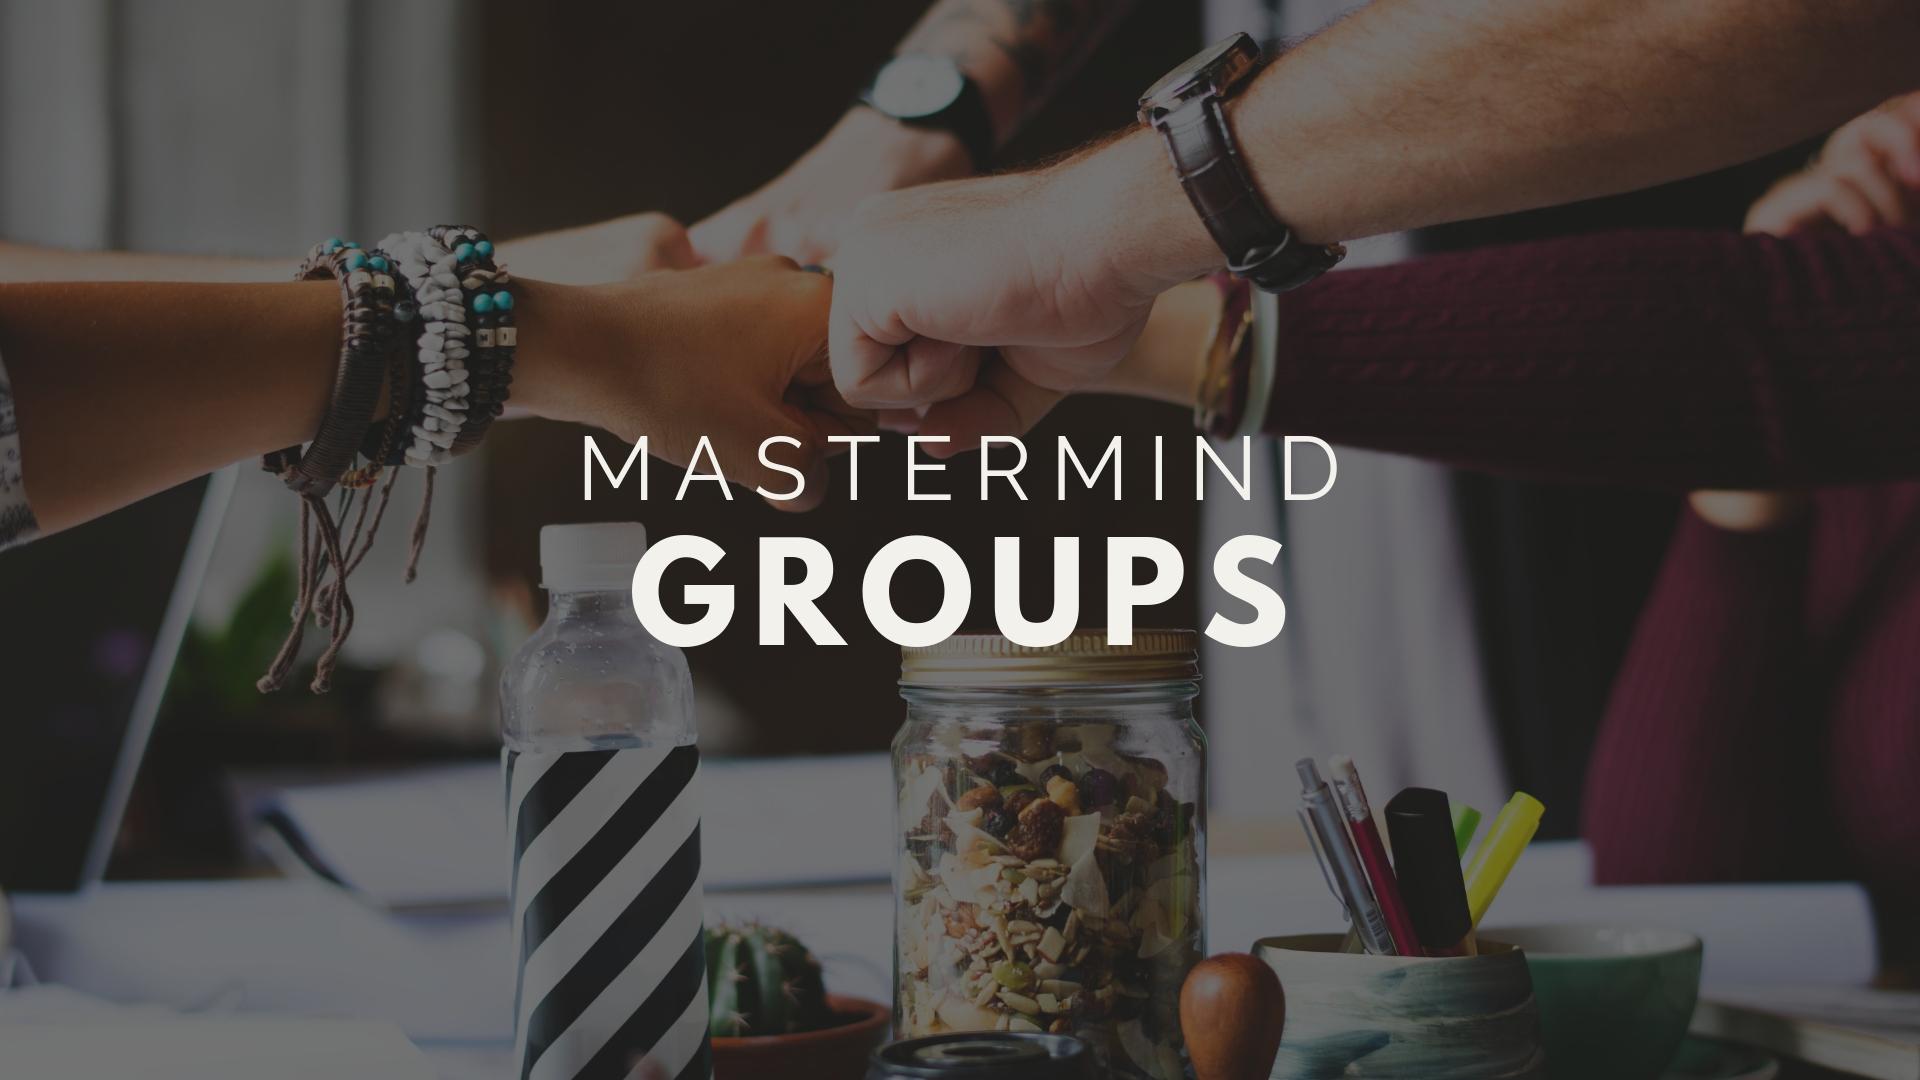 mastermind groups.jpg